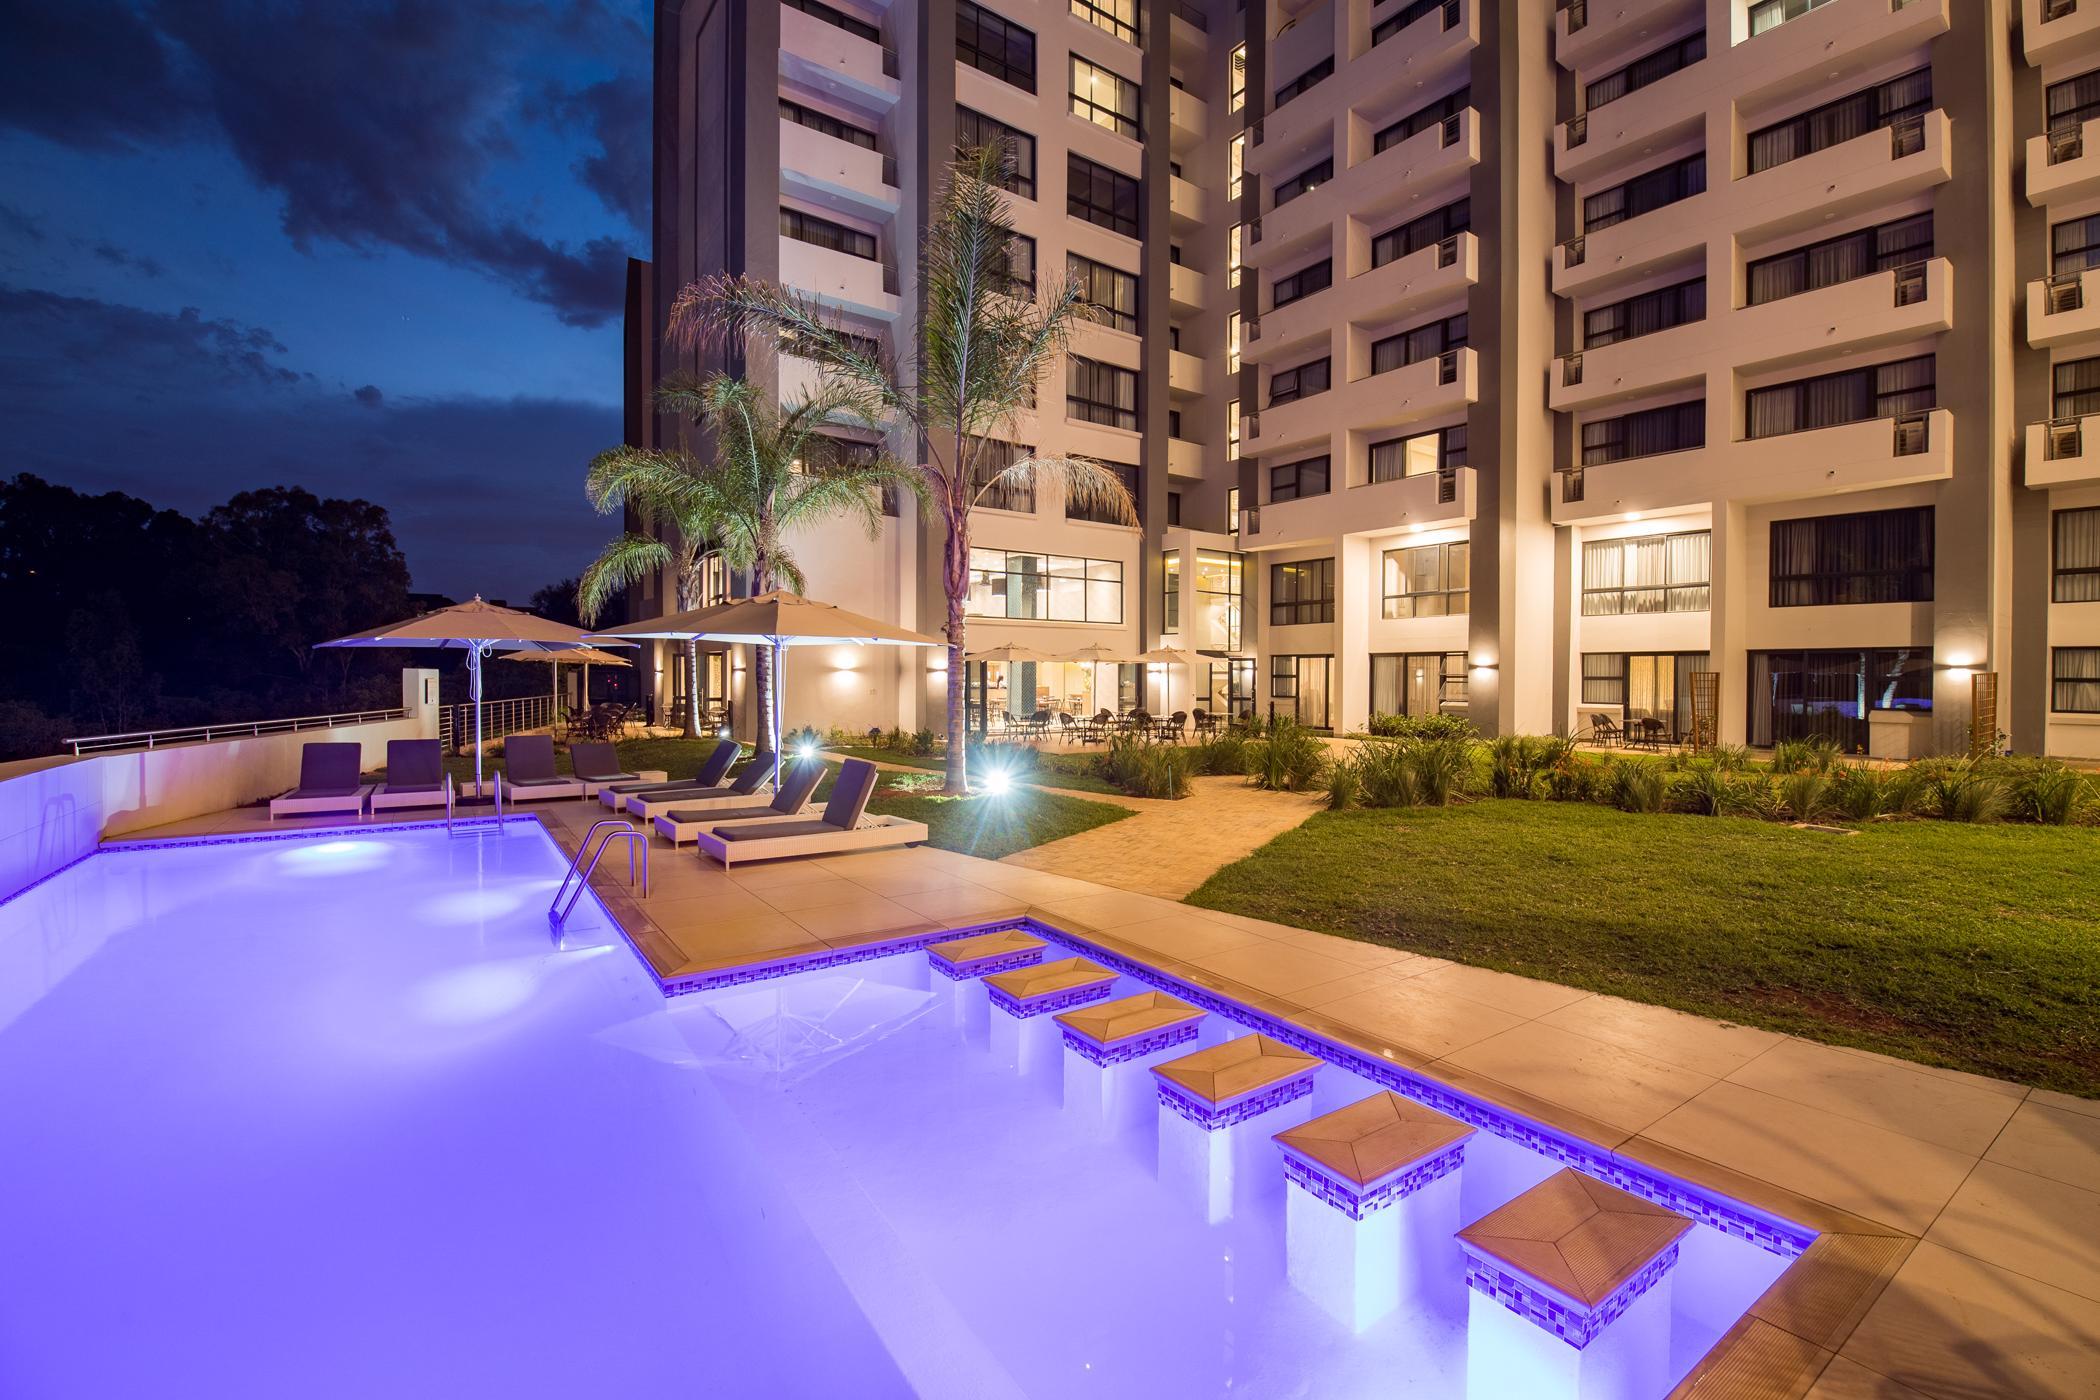 1 Bedroom Apartment To Rent Menlyn Ptl1392096 Pam Golding